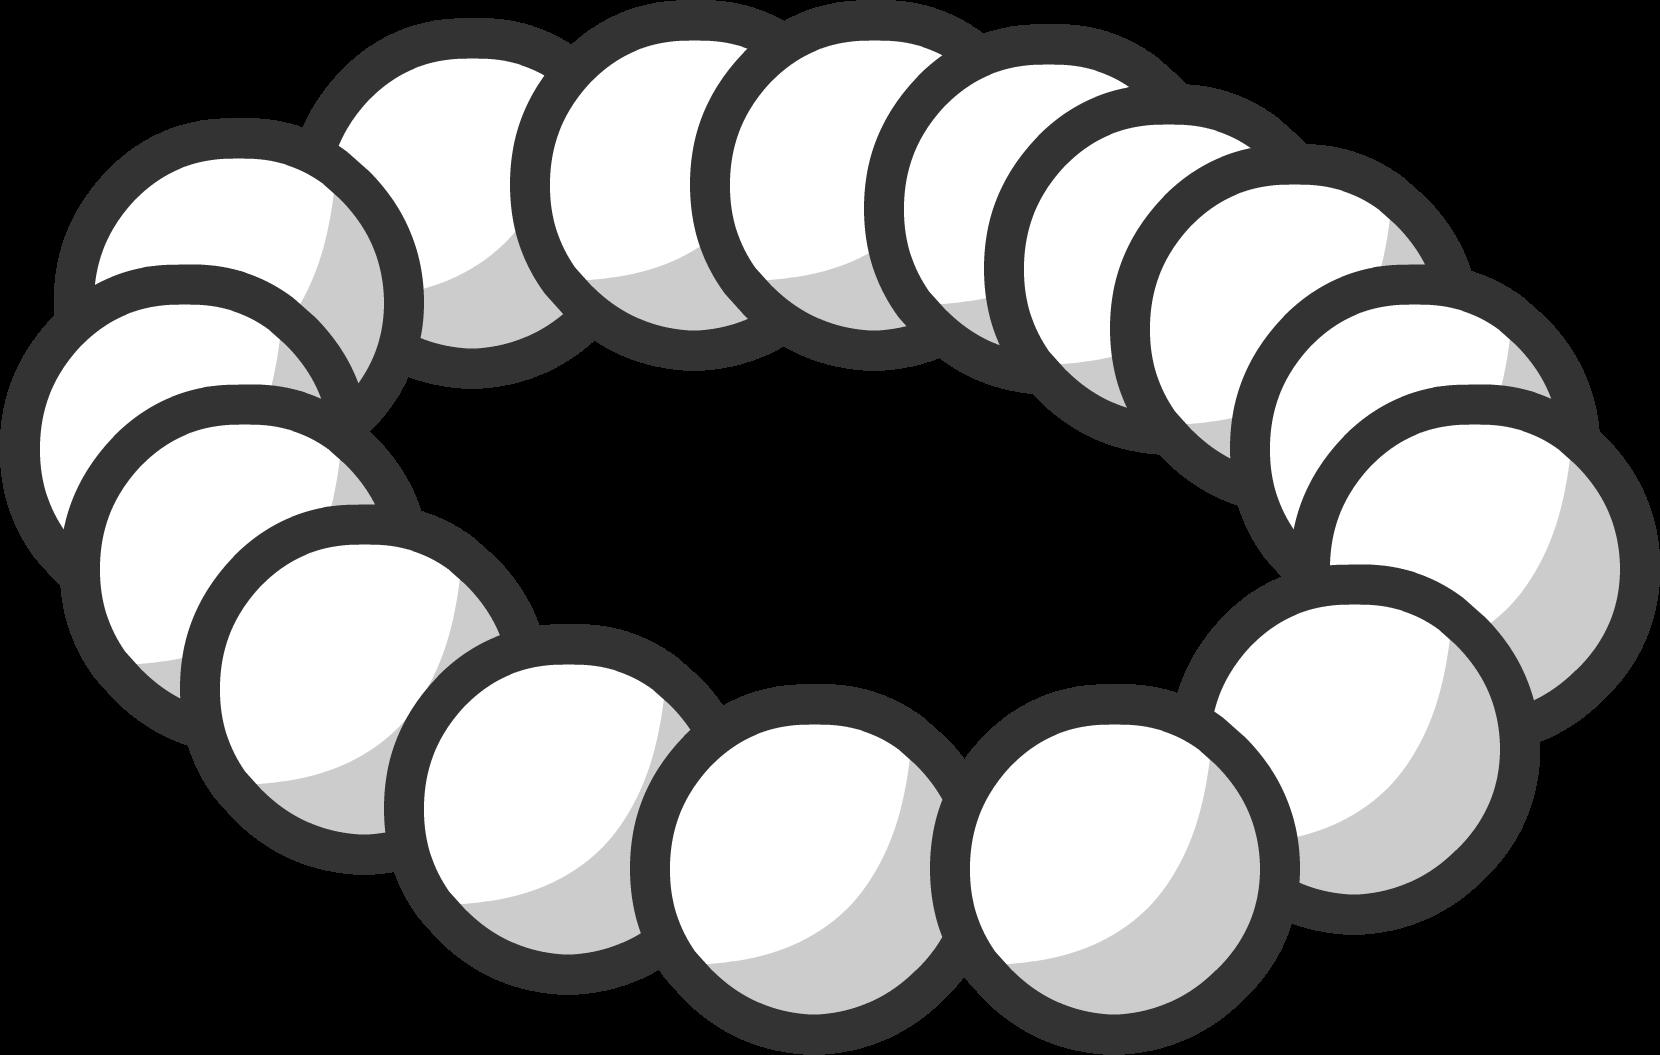 Necklace clipart pearl necklace. Club penguin wiki fandom